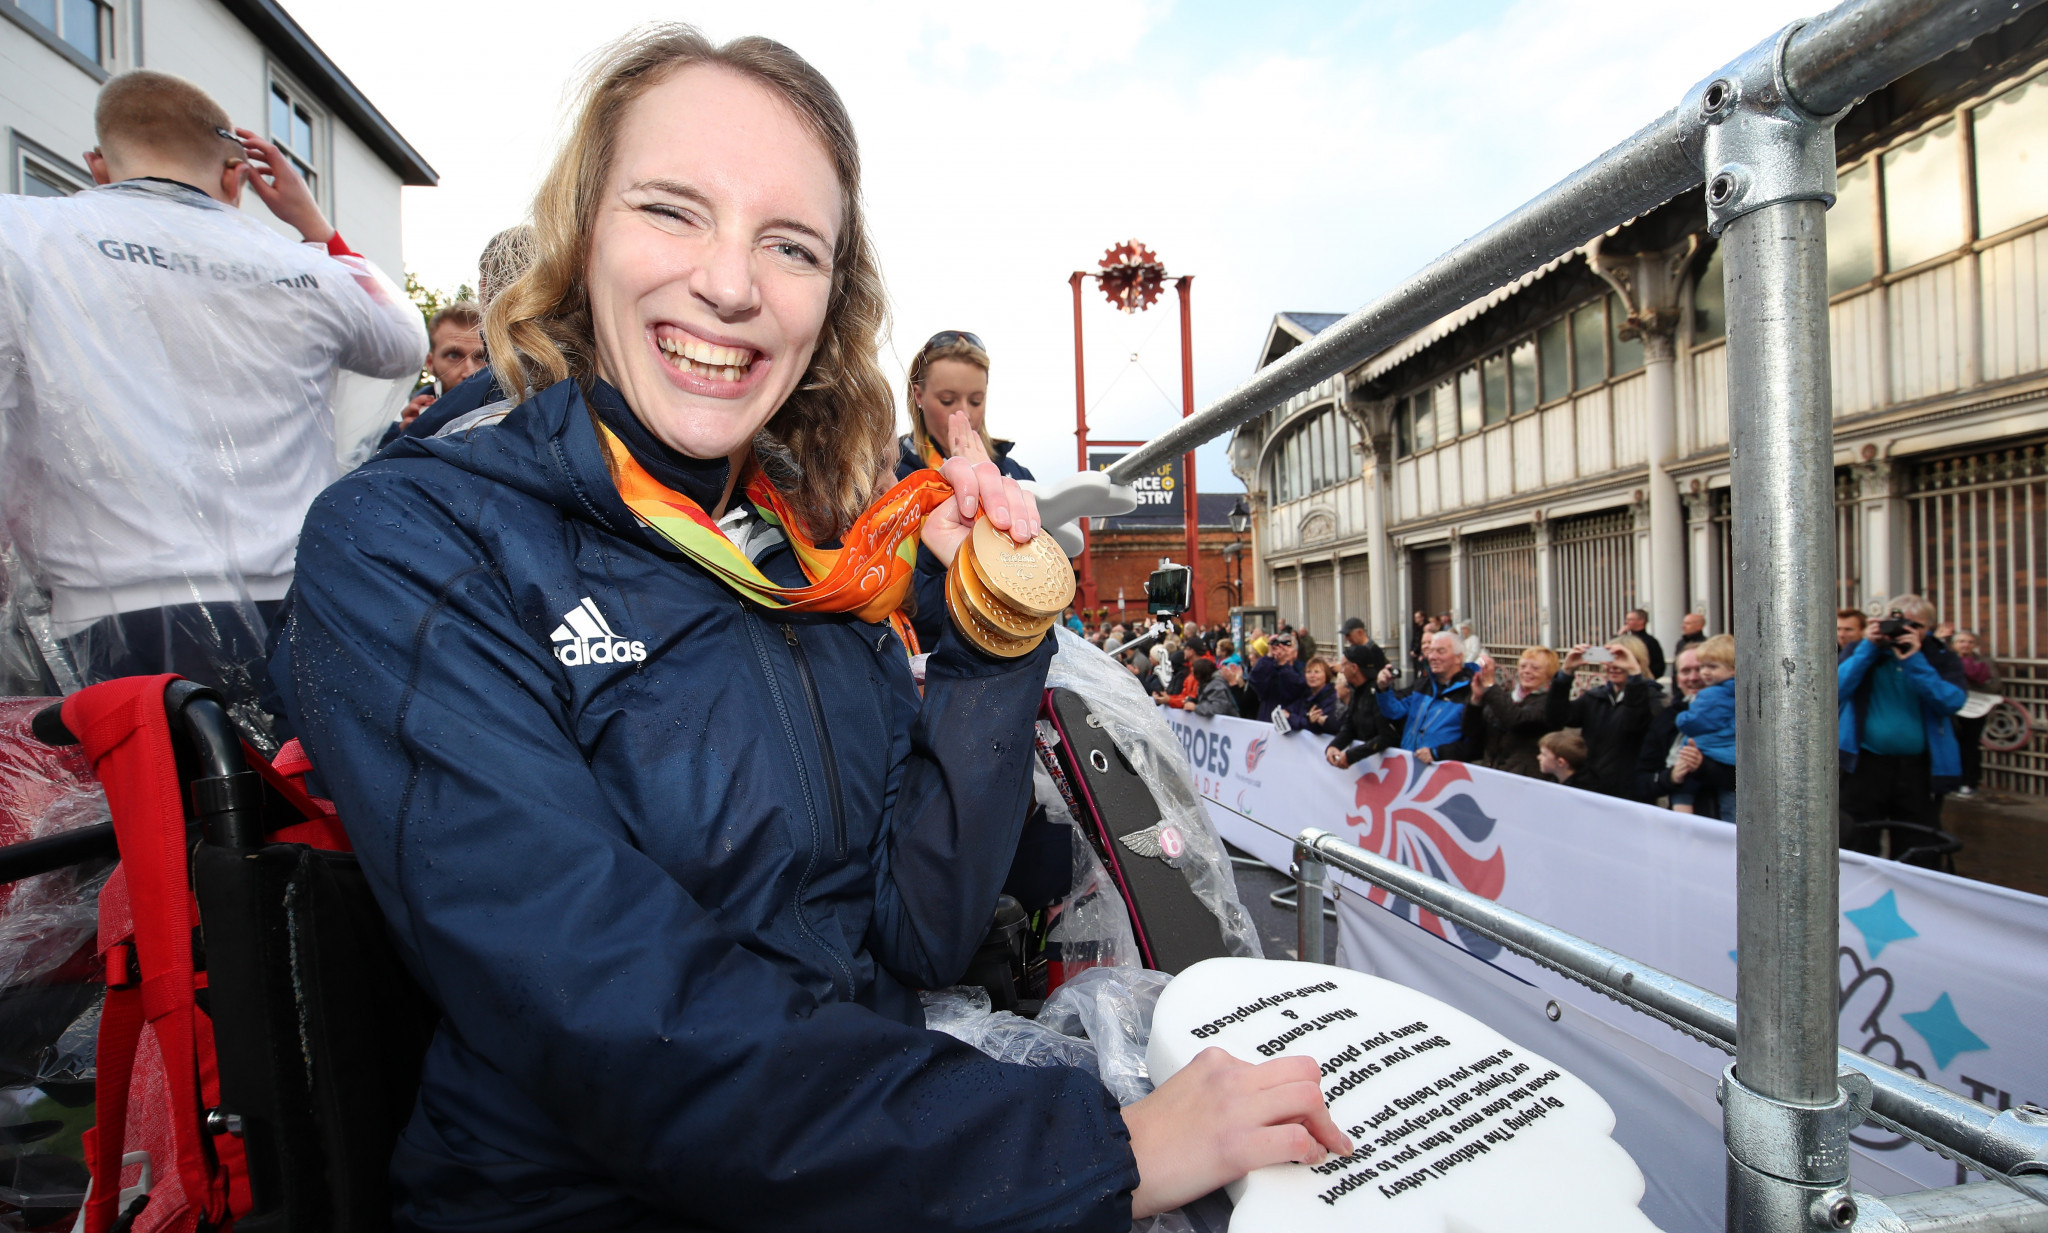 IPC unveil film to showcase London 2012 Paralympic Games employment legacy